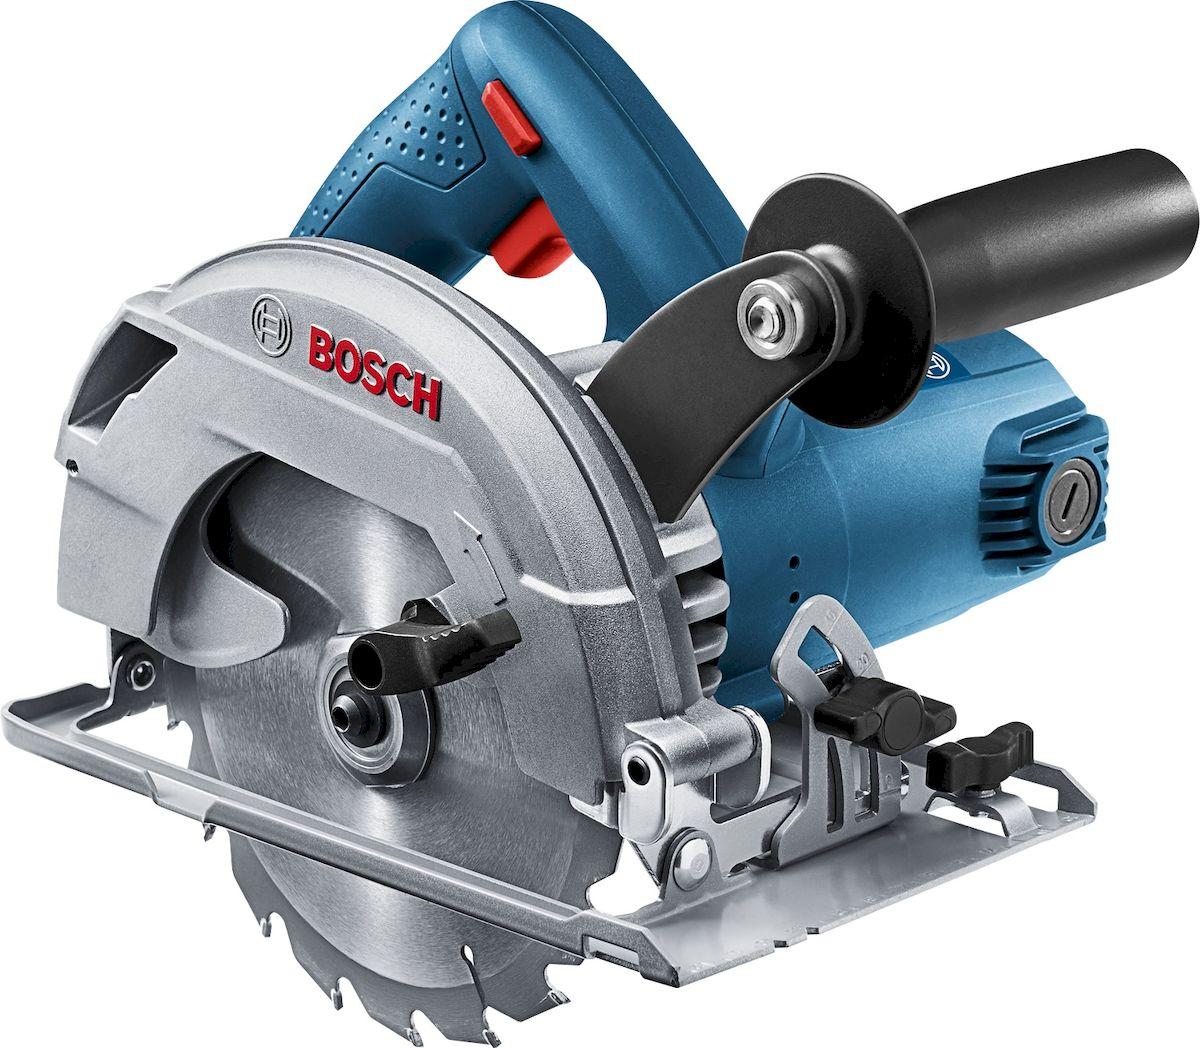 Пила циркулярная Bosch GKS 600. 06016A9020 пила bosch gks 600